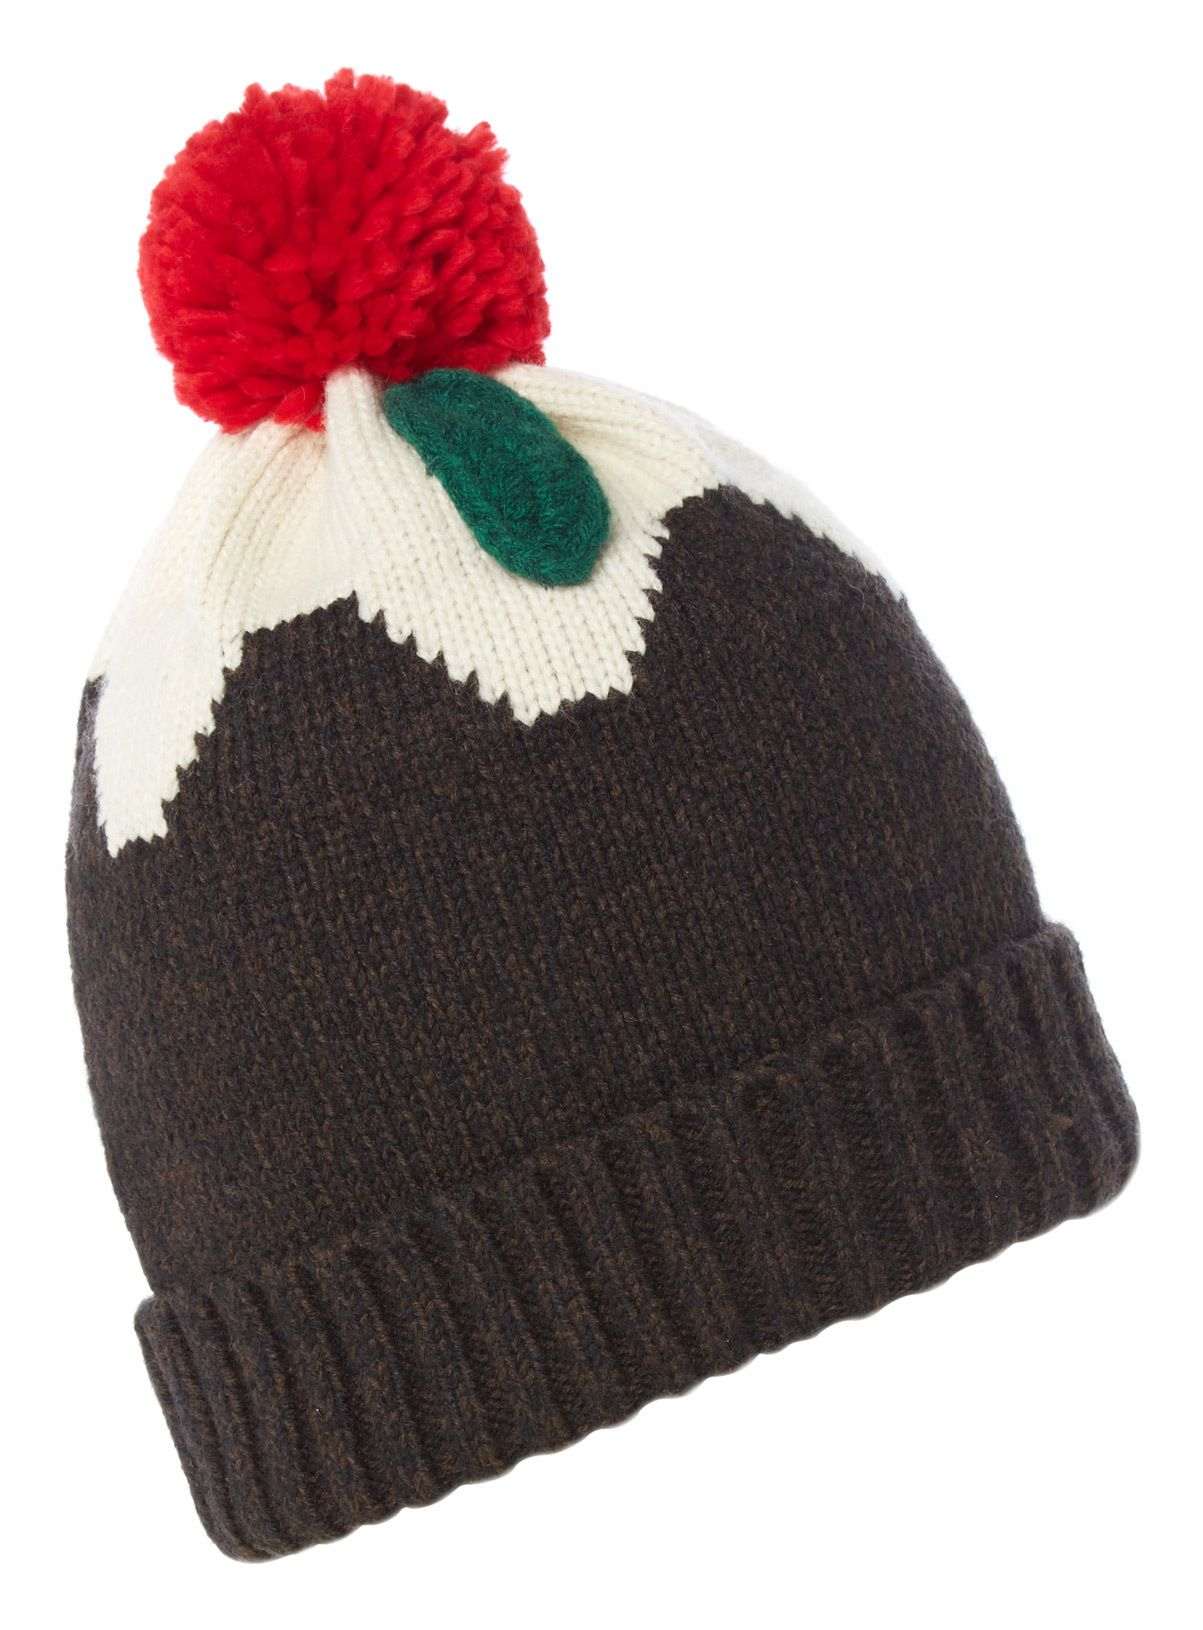 Sku Xmas Pudding Hat Brown Christmas Pudding Xmas Pudding Pom Pom Tops